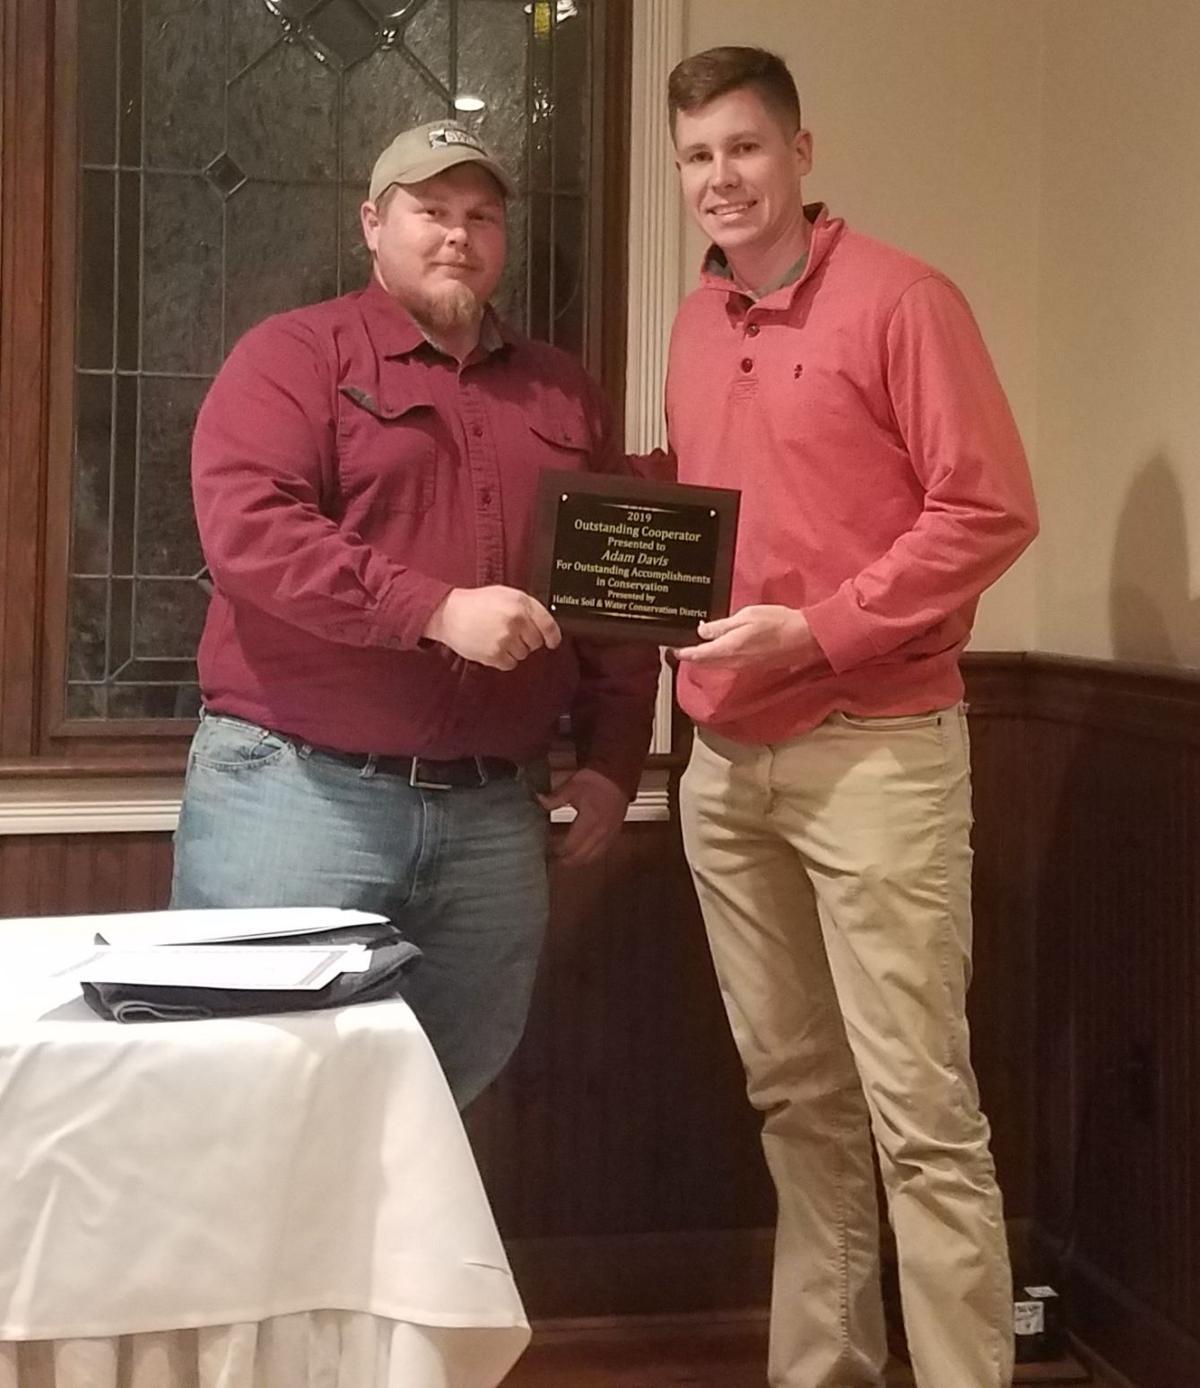 Outstanding cooperator award